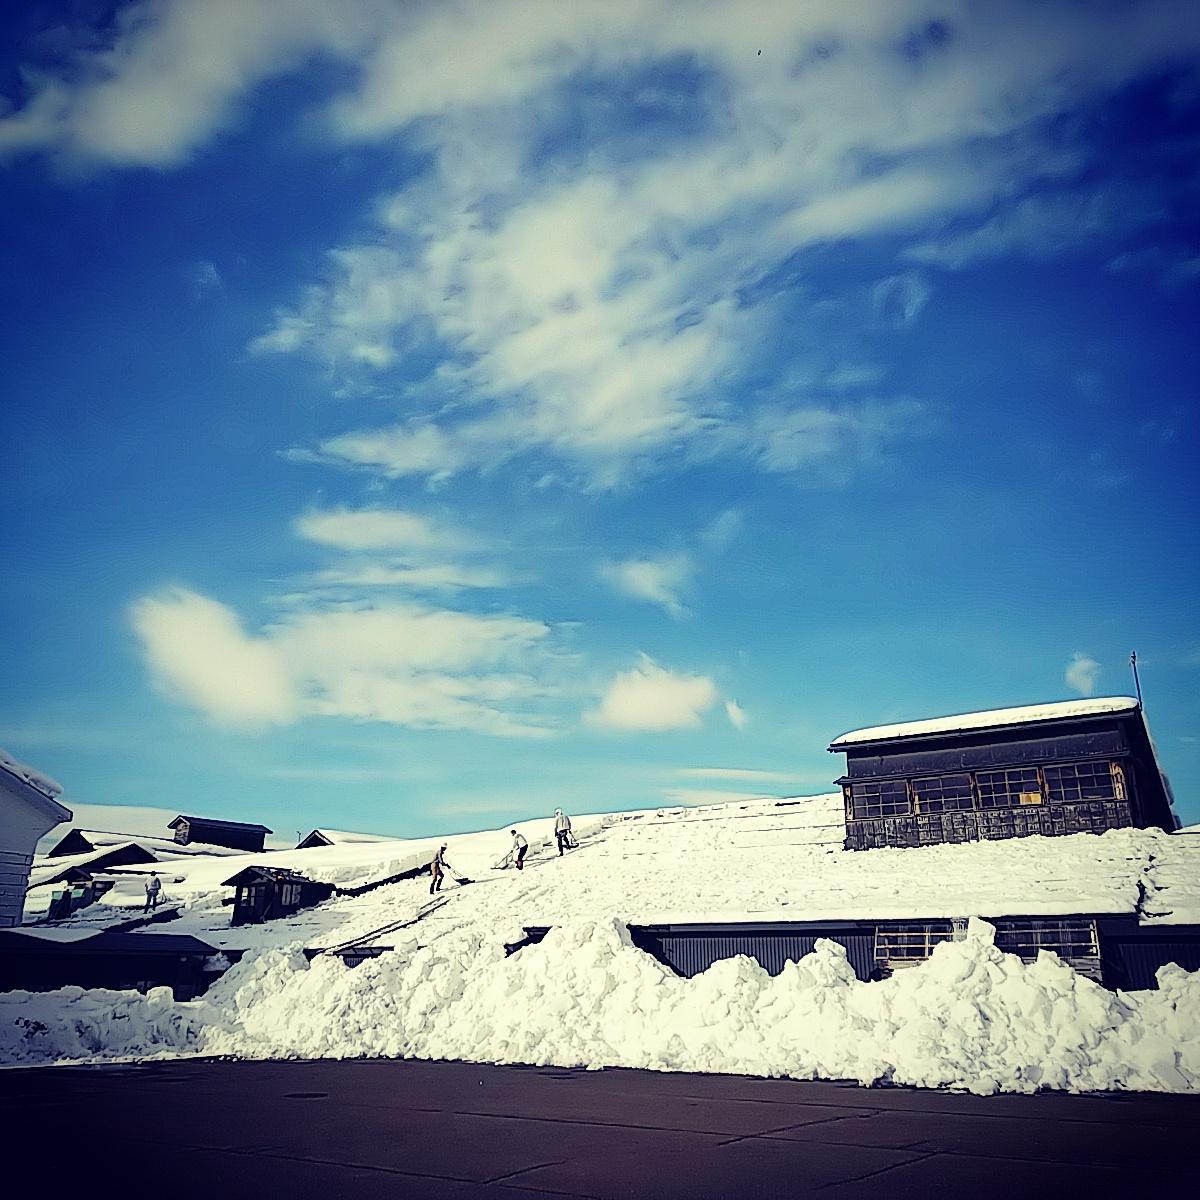 http://www.fukukomachi.com/blog/photo/IMG_20180115_140113_506.jpg